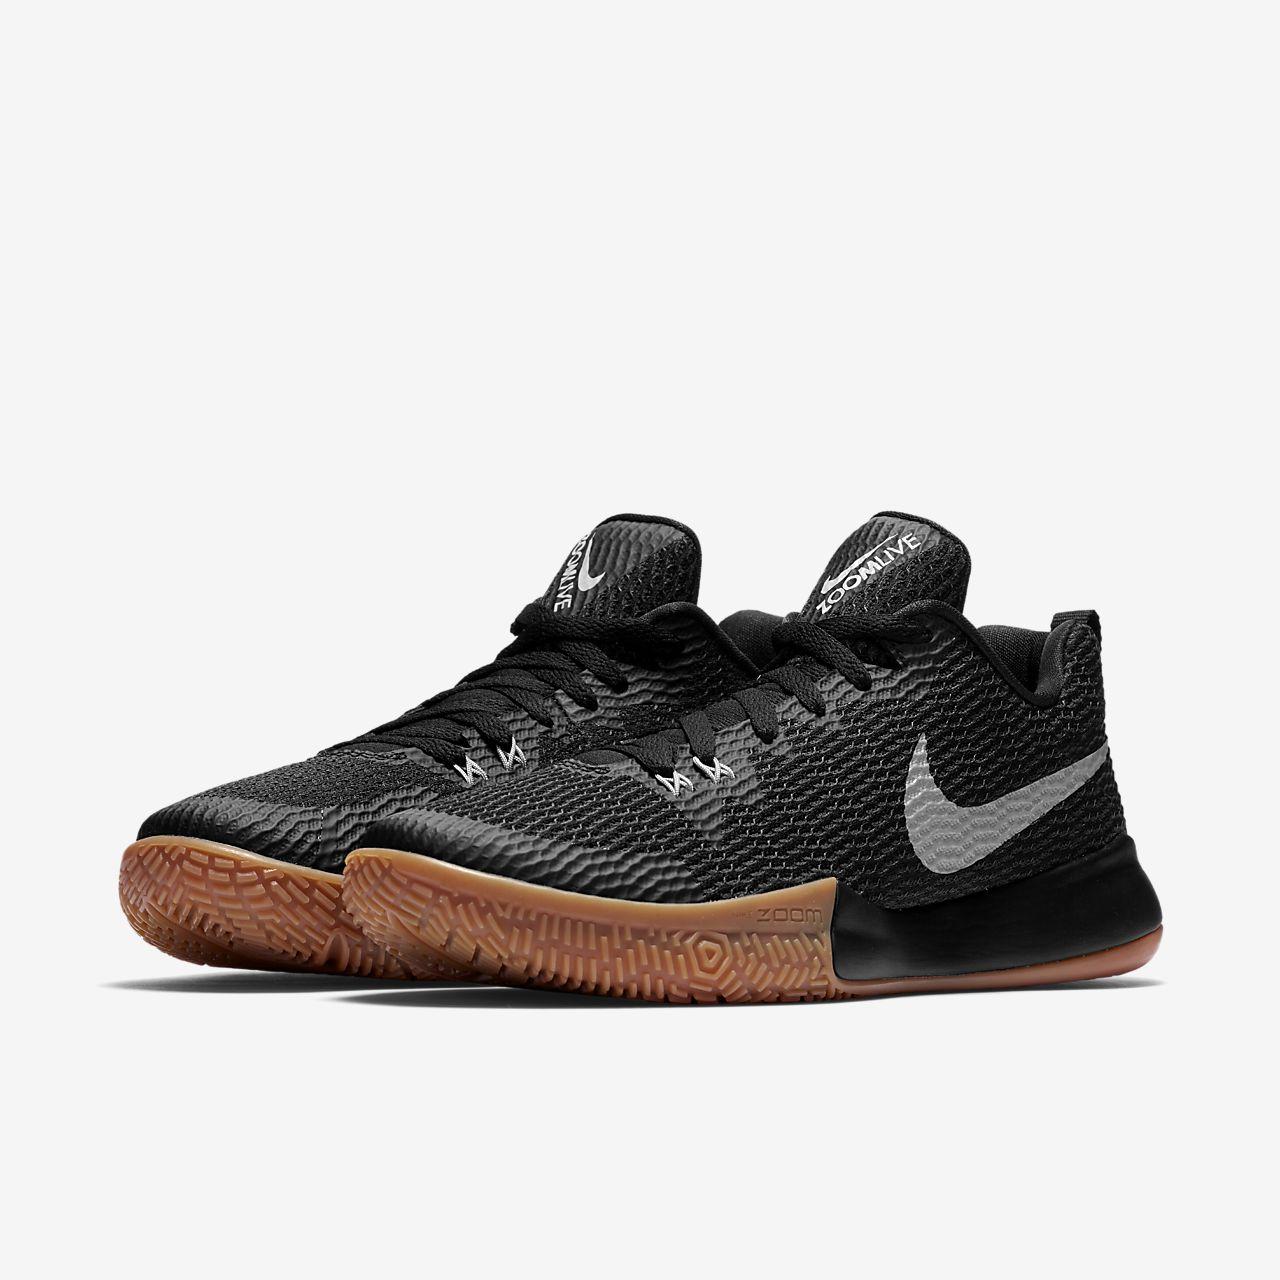 0f1a63bbfab0 nike zoom live ii mens basketball shoe